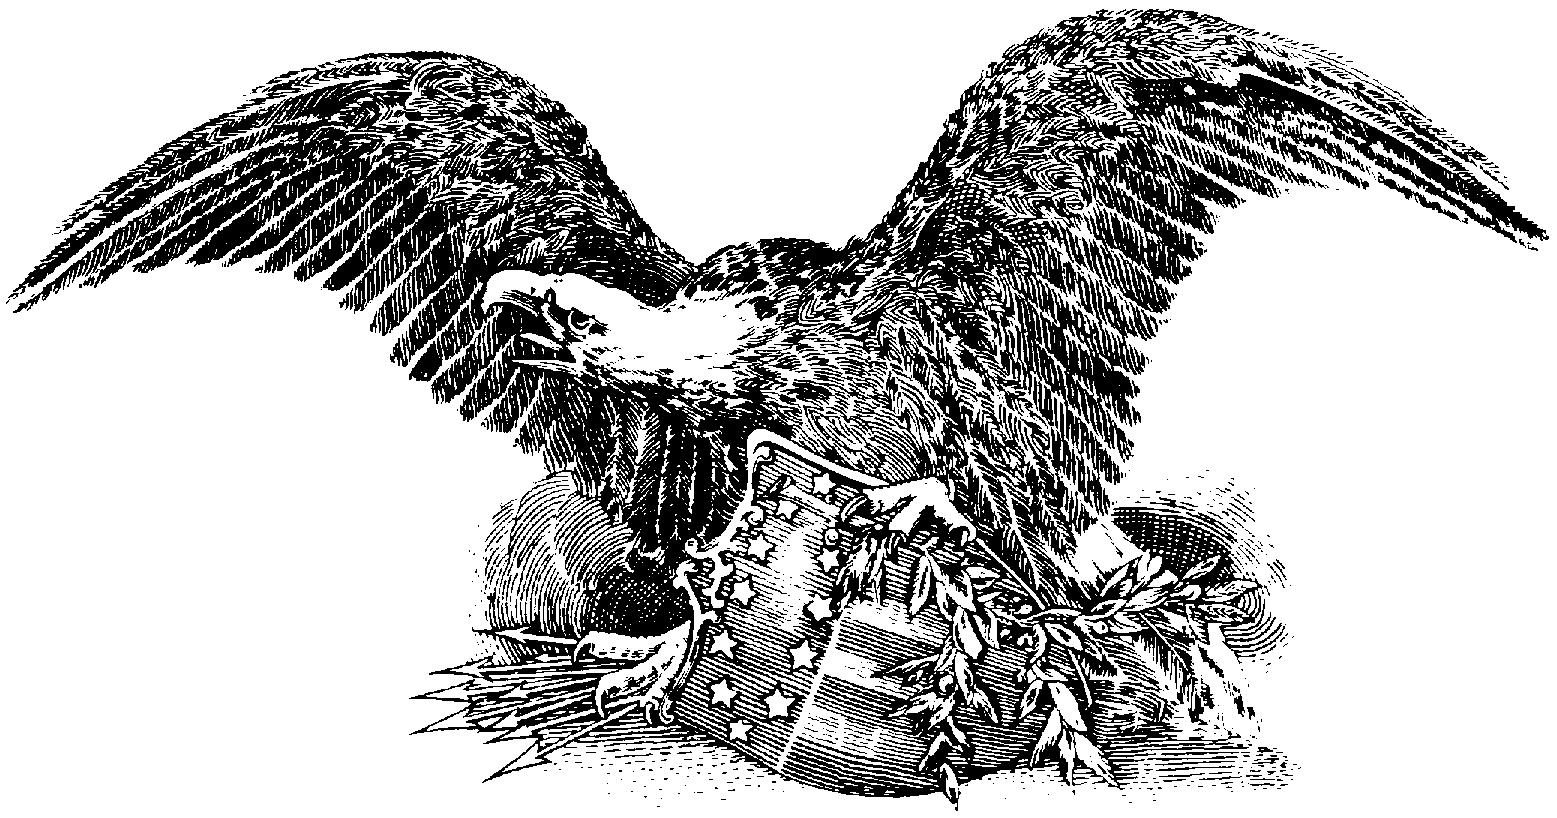 Free American Eagle Cliparts, Download Free Clip Art, Free Clip Art.